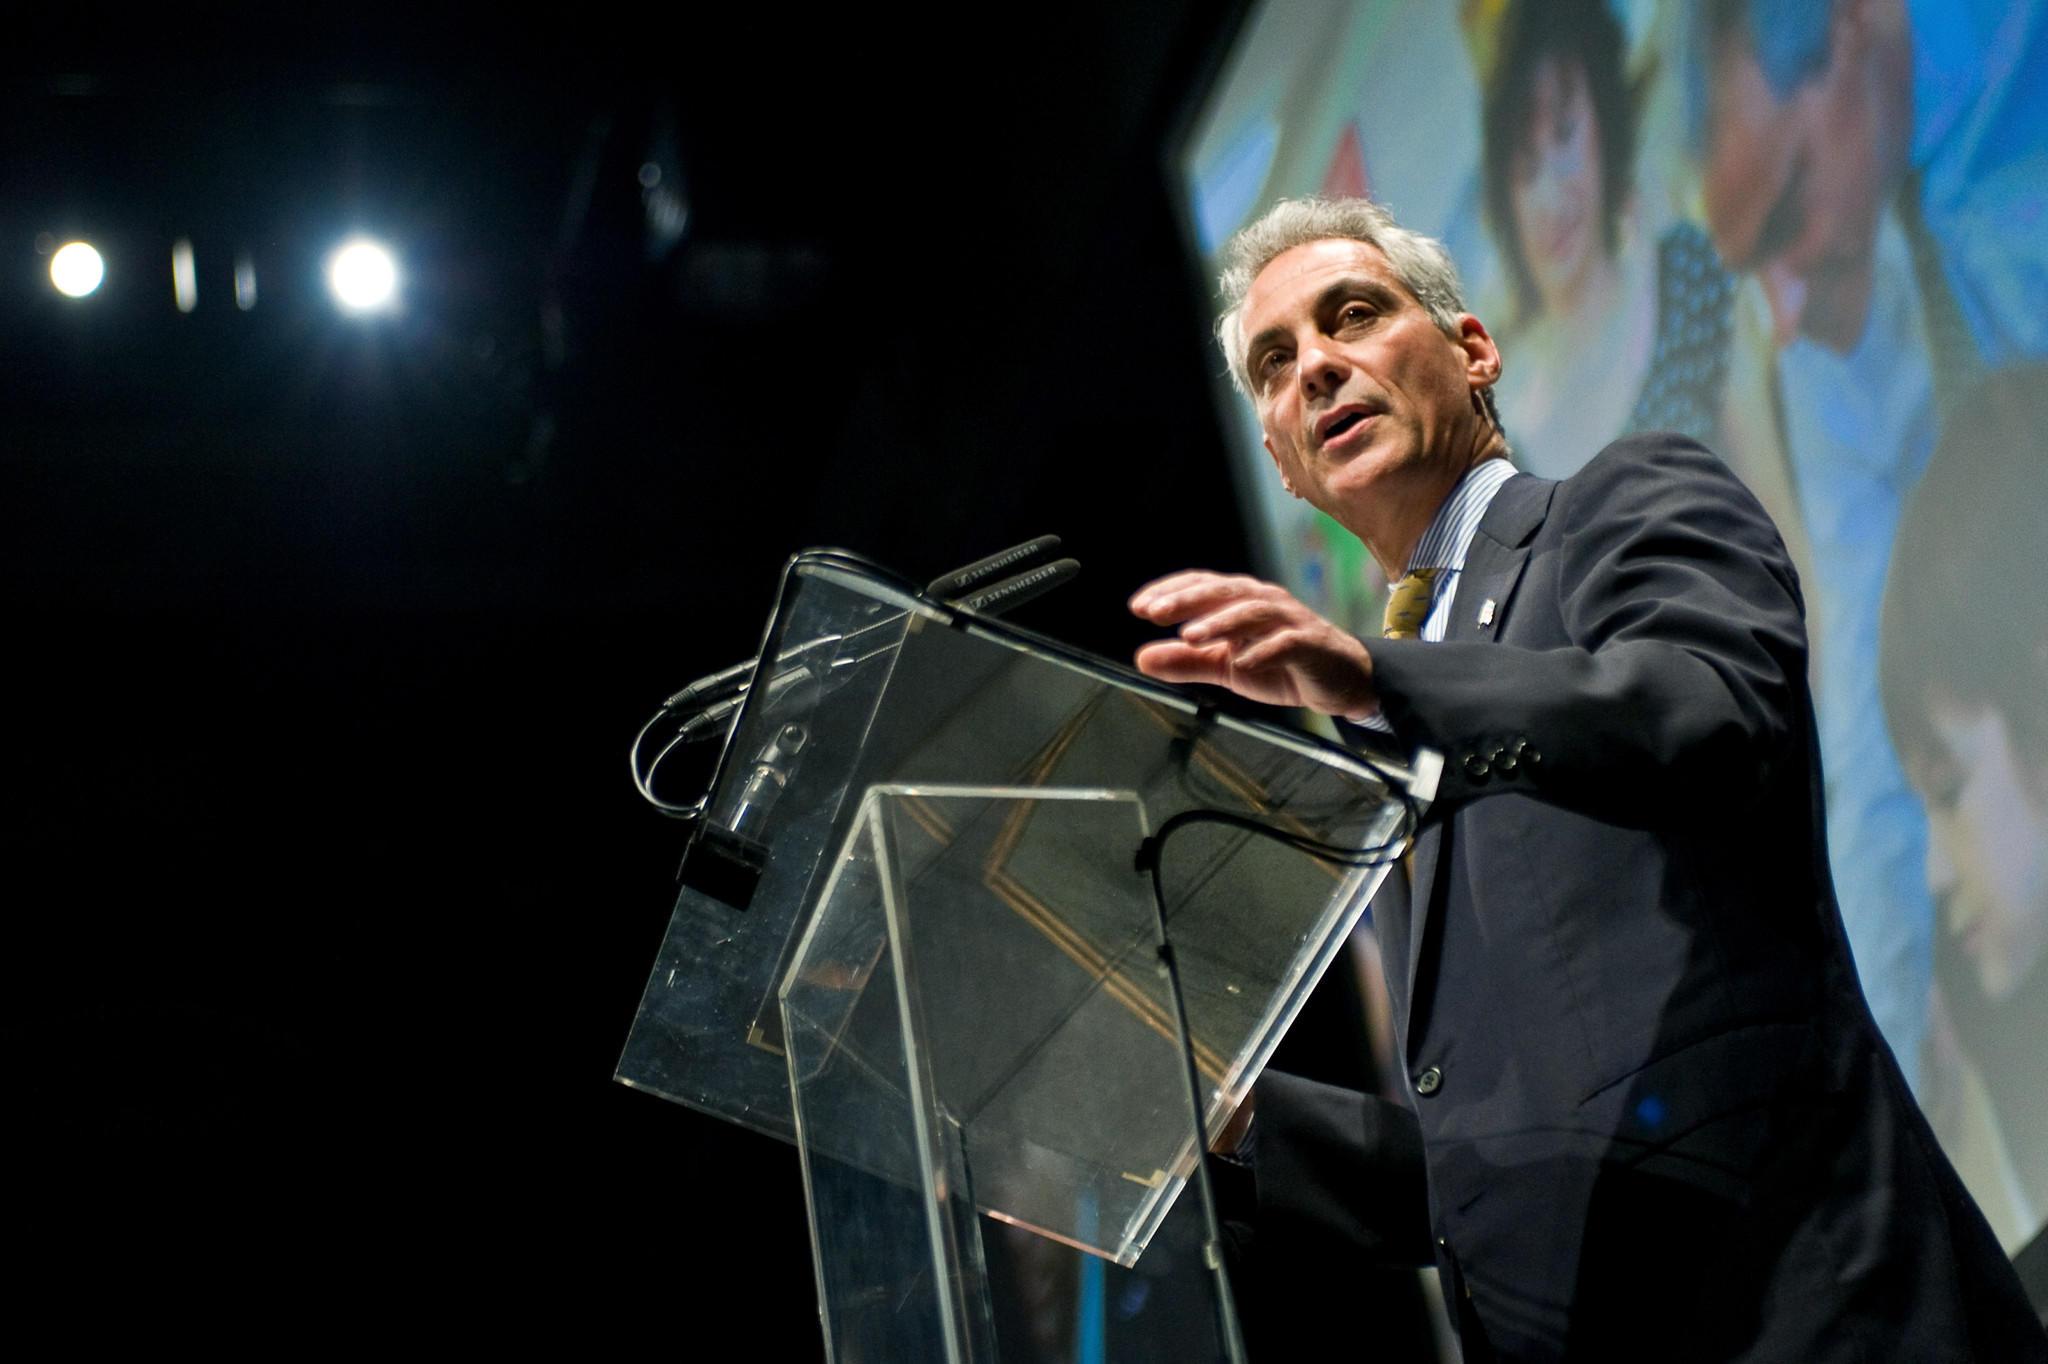 Mayor Rahm Emanuel attends the 2012 Carl Sandburg Literary Awards dinner at University of Illinois at Chicago Forum October 2012.